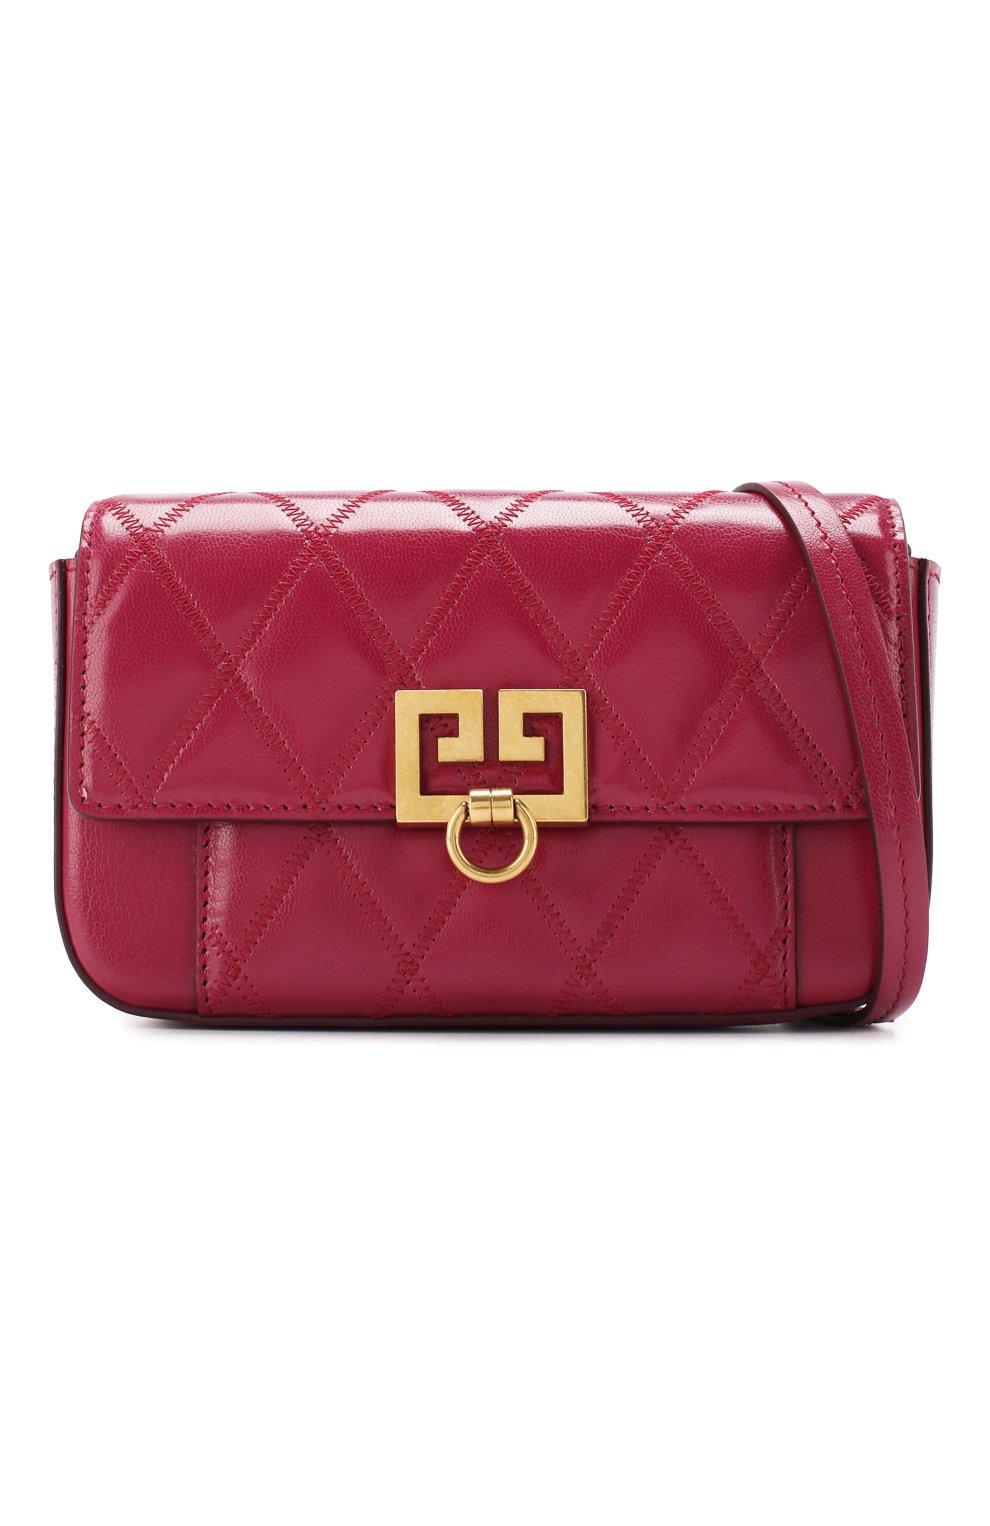 Поясная сумка Pocket Givenchy фиолетовая | Фото №6